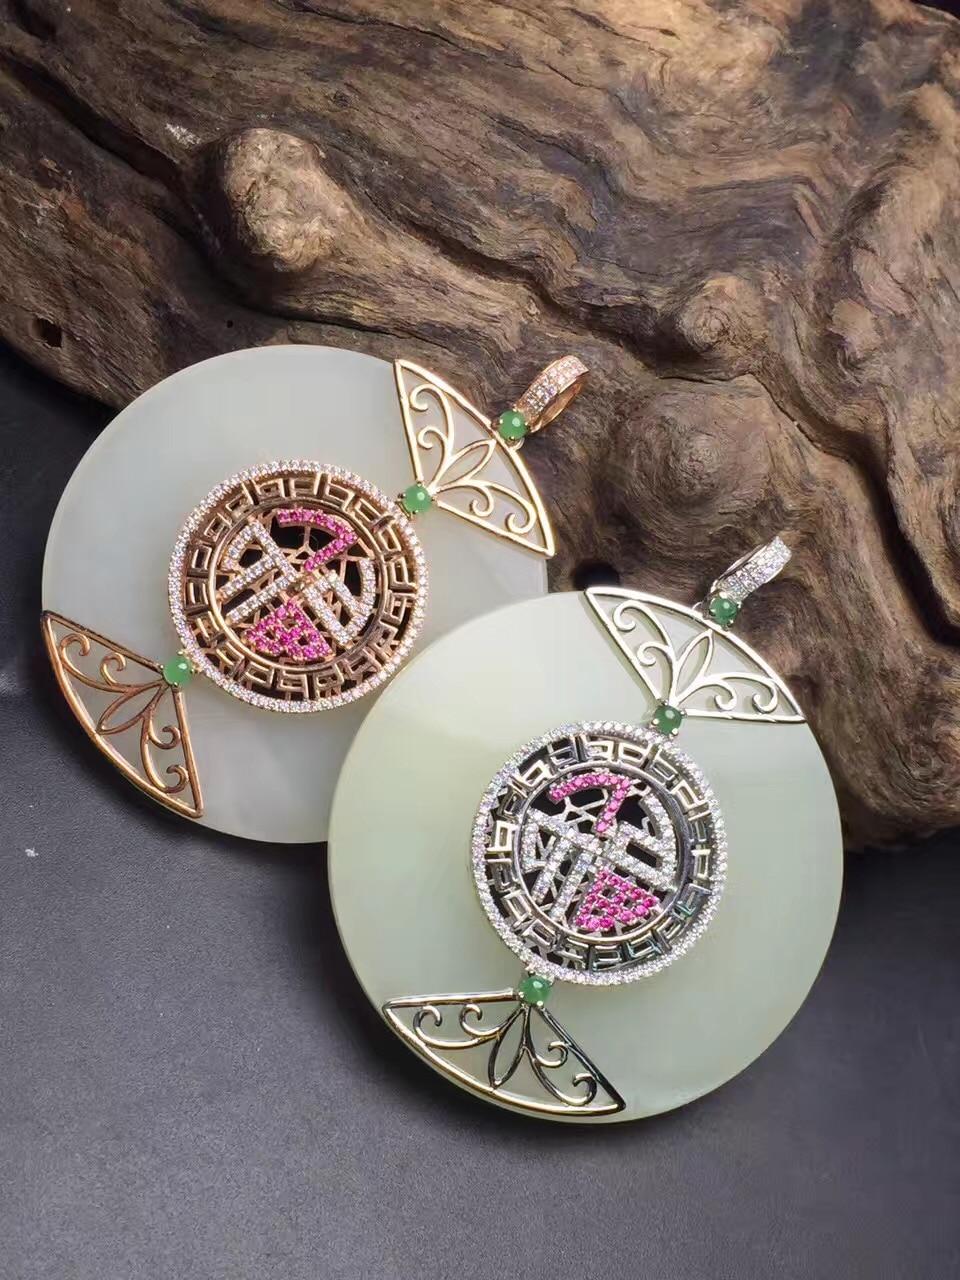 Fine Jewelry Real 925 Steling Silver s925 Myanmer Origin 100% Natural Jade Gemstone Female Pendant Necklaces Christmas Gift fine jewelry real 925 steling silver s925 100